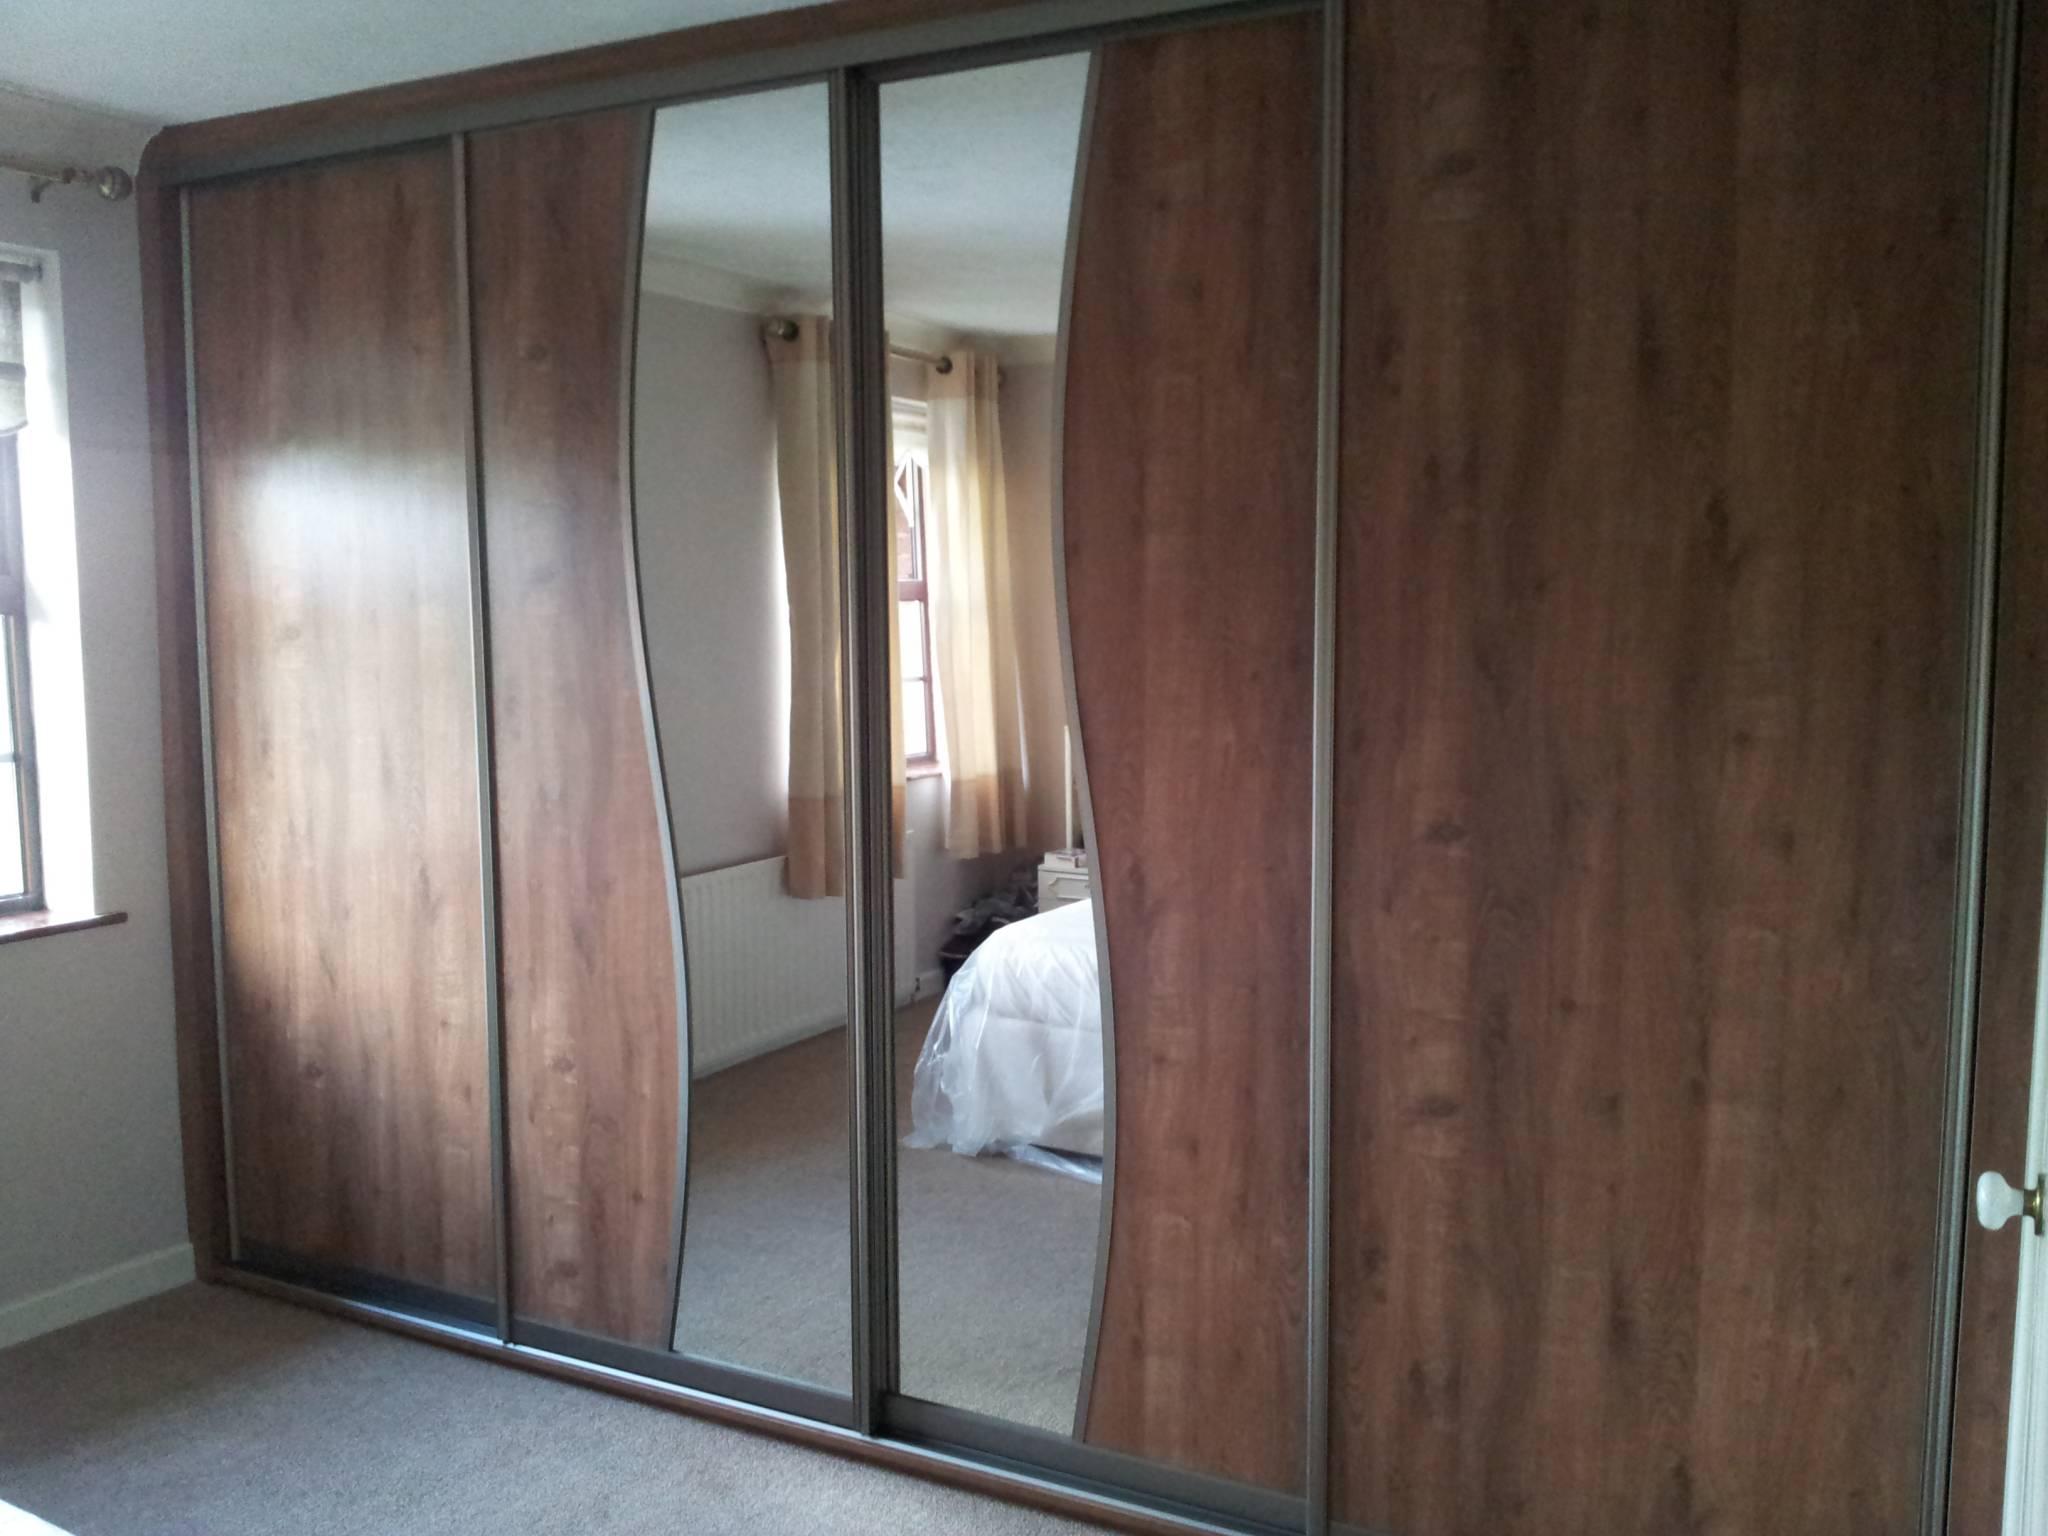 display sliding wardrobe for sale for only 1399 fitted. Black Bedroom Furniture Sets. Home Design Ideas